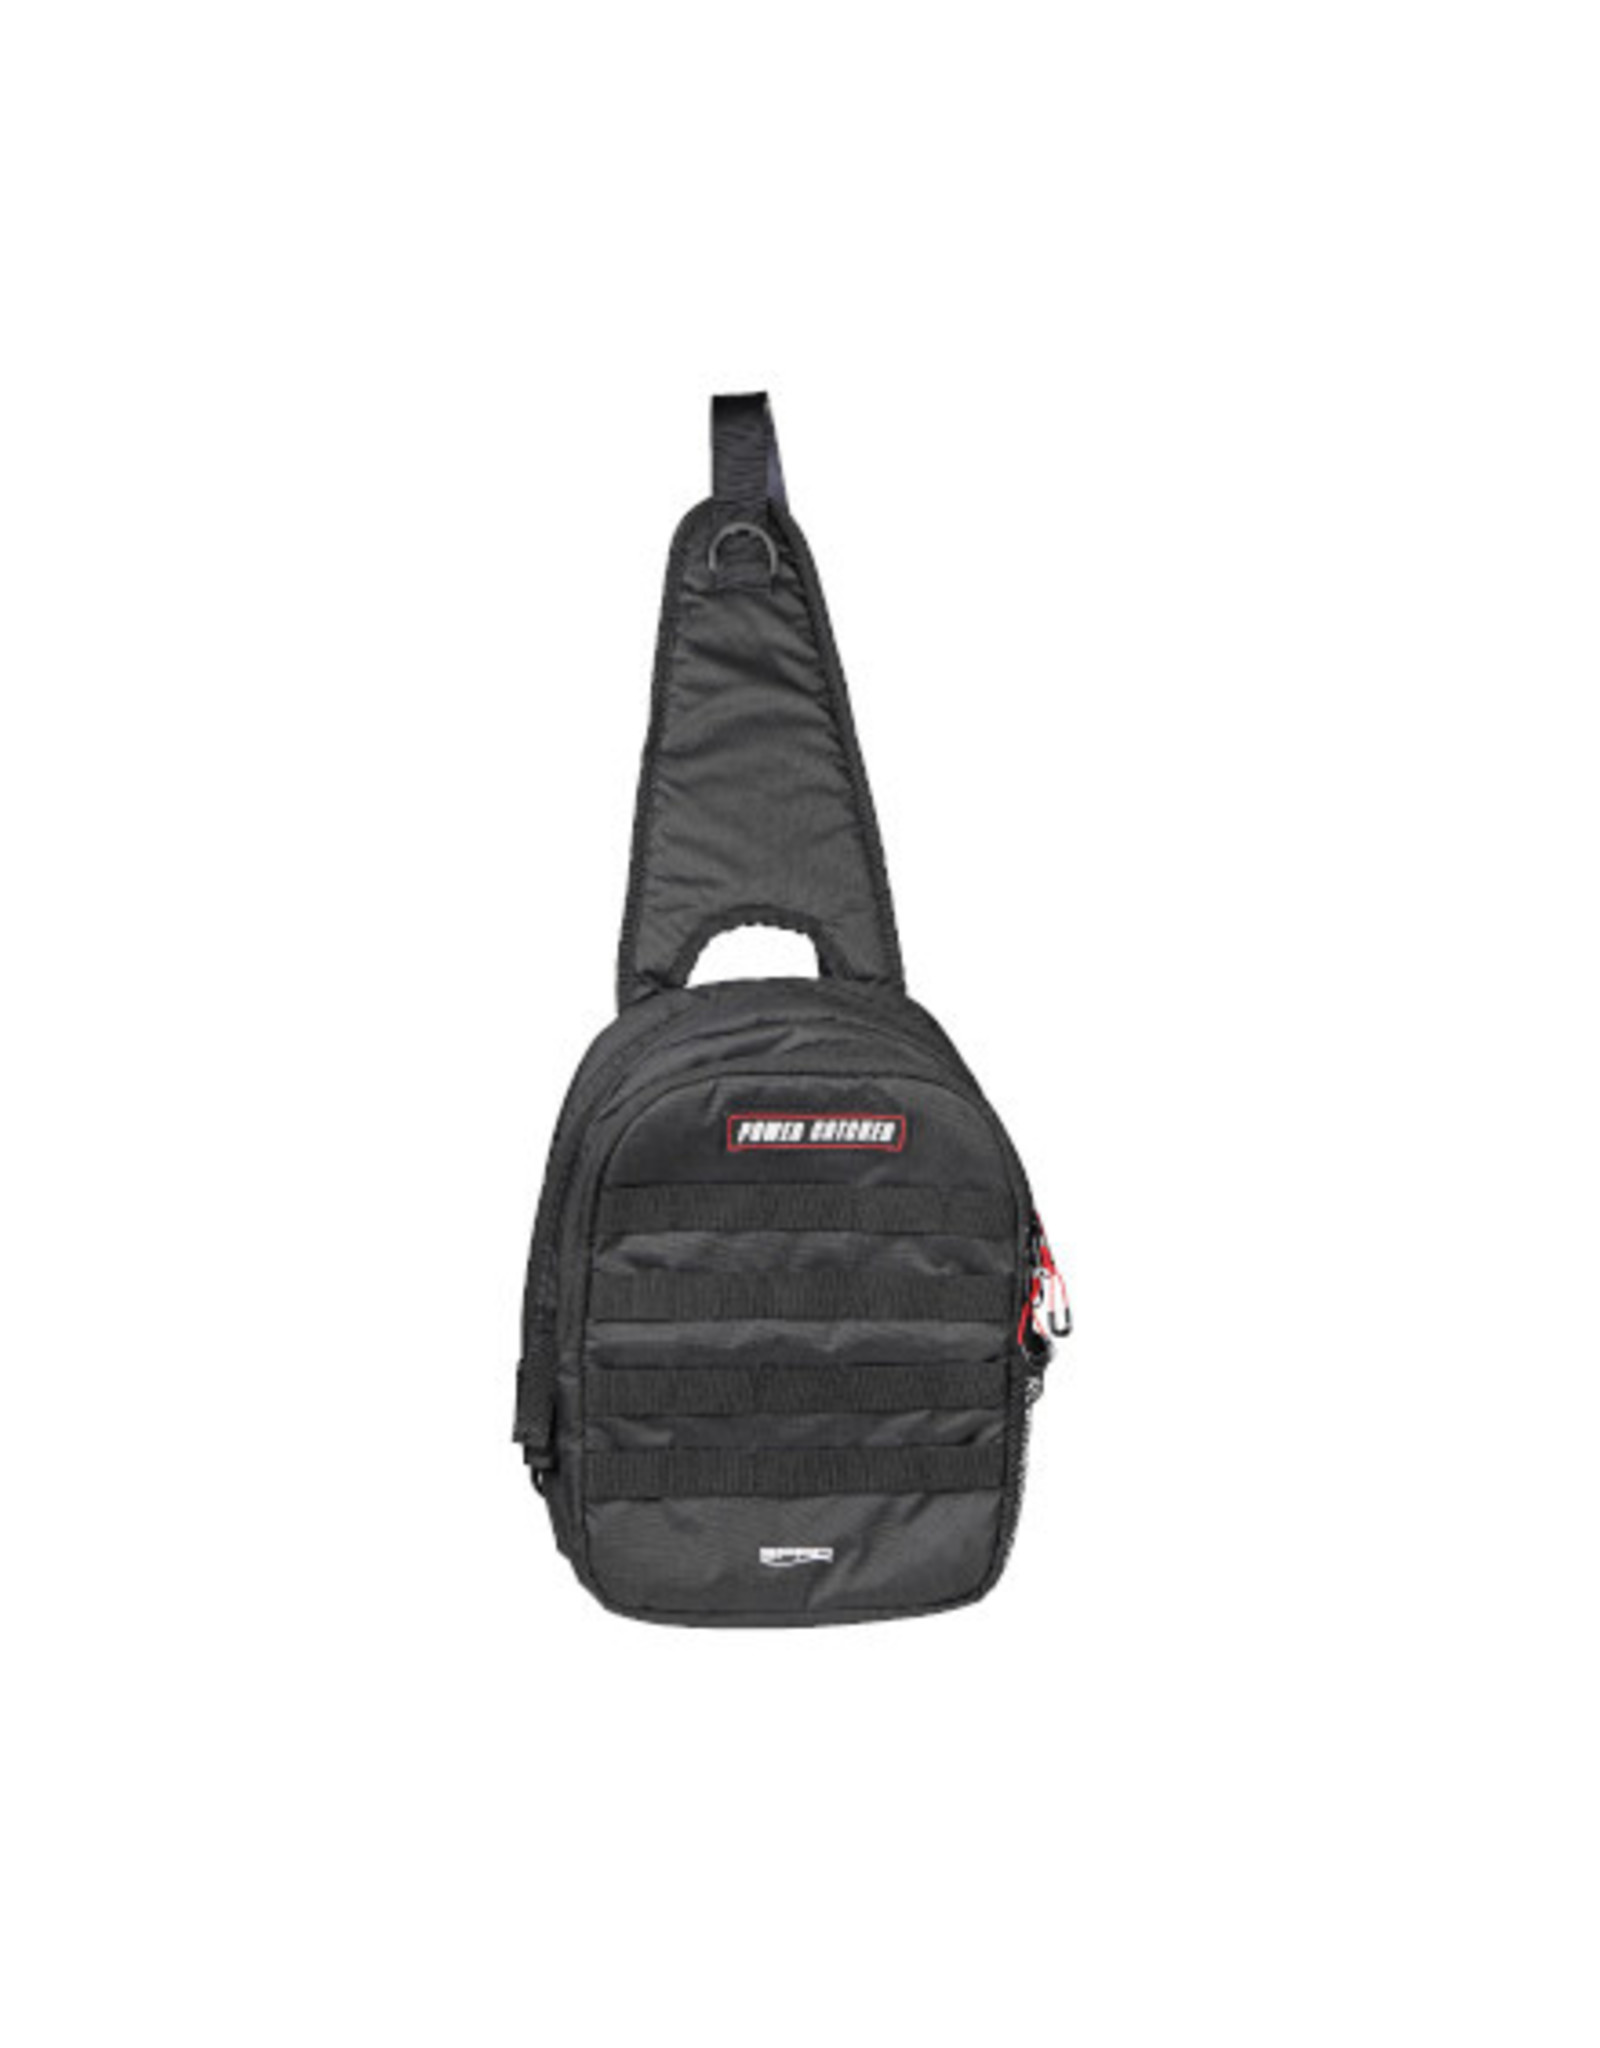 SPRO Powercatcher Sling Bag